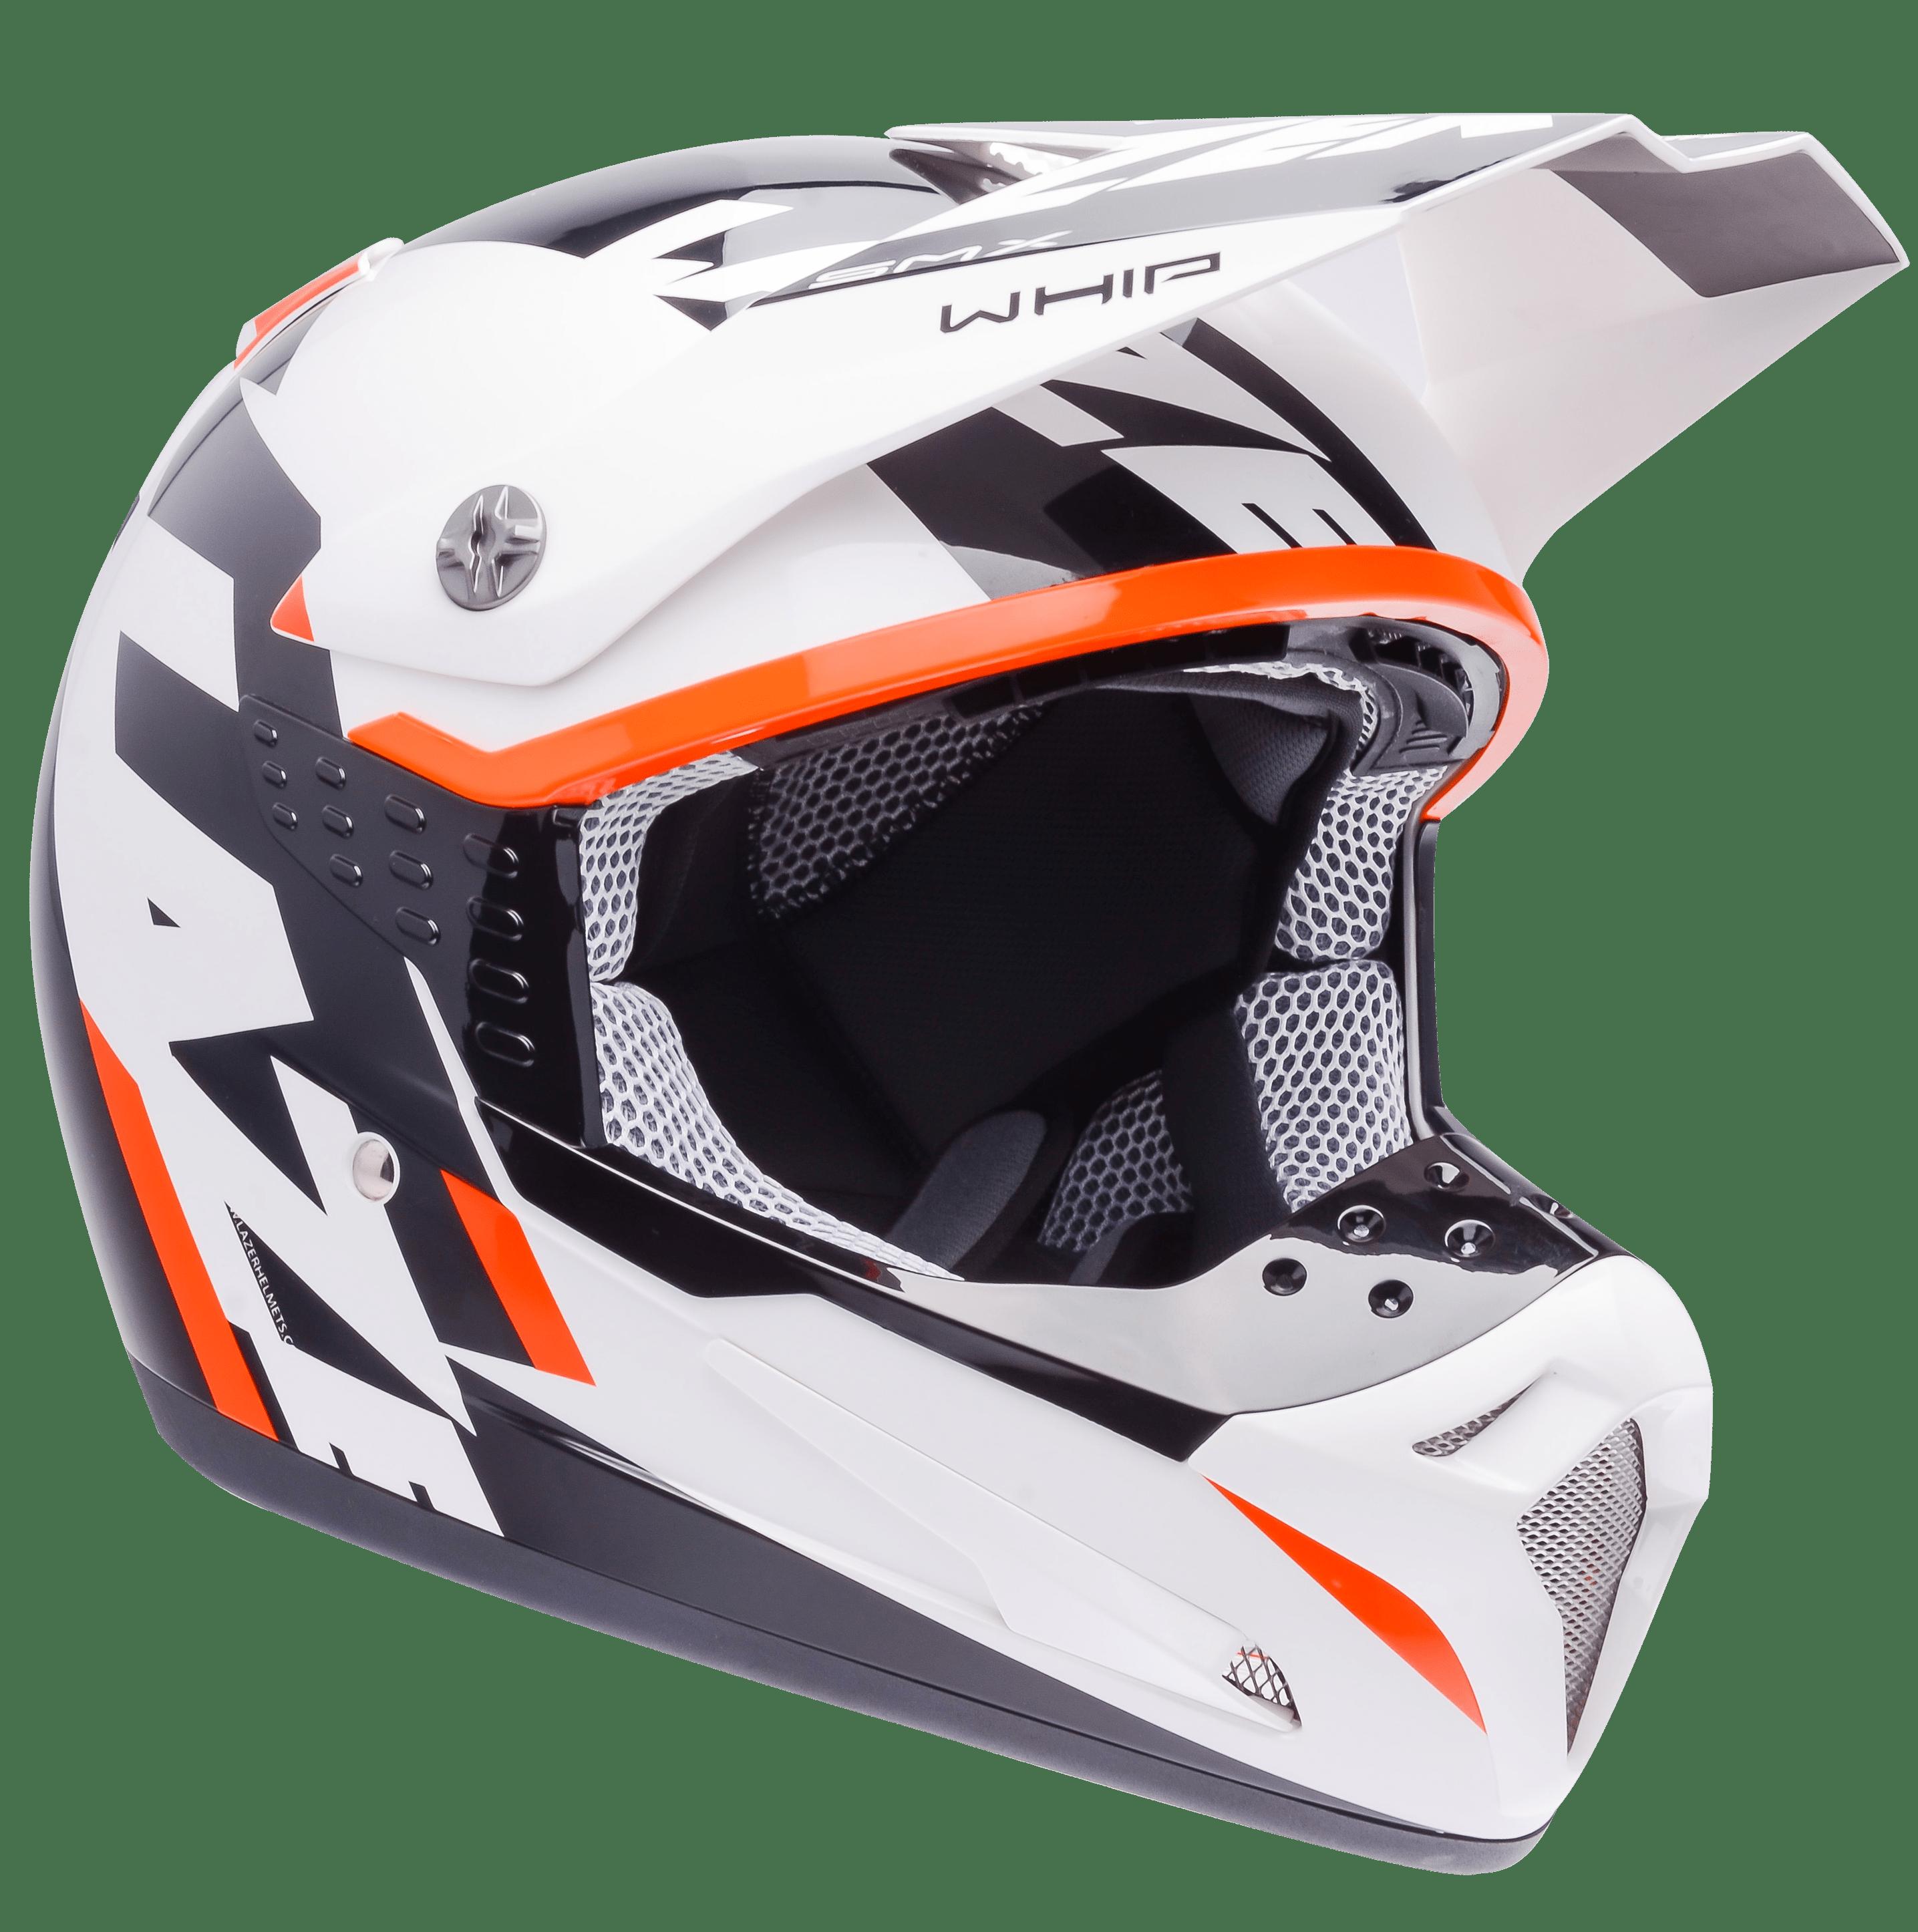 Helmet clipart orange. Motorcycle lazer smx whip